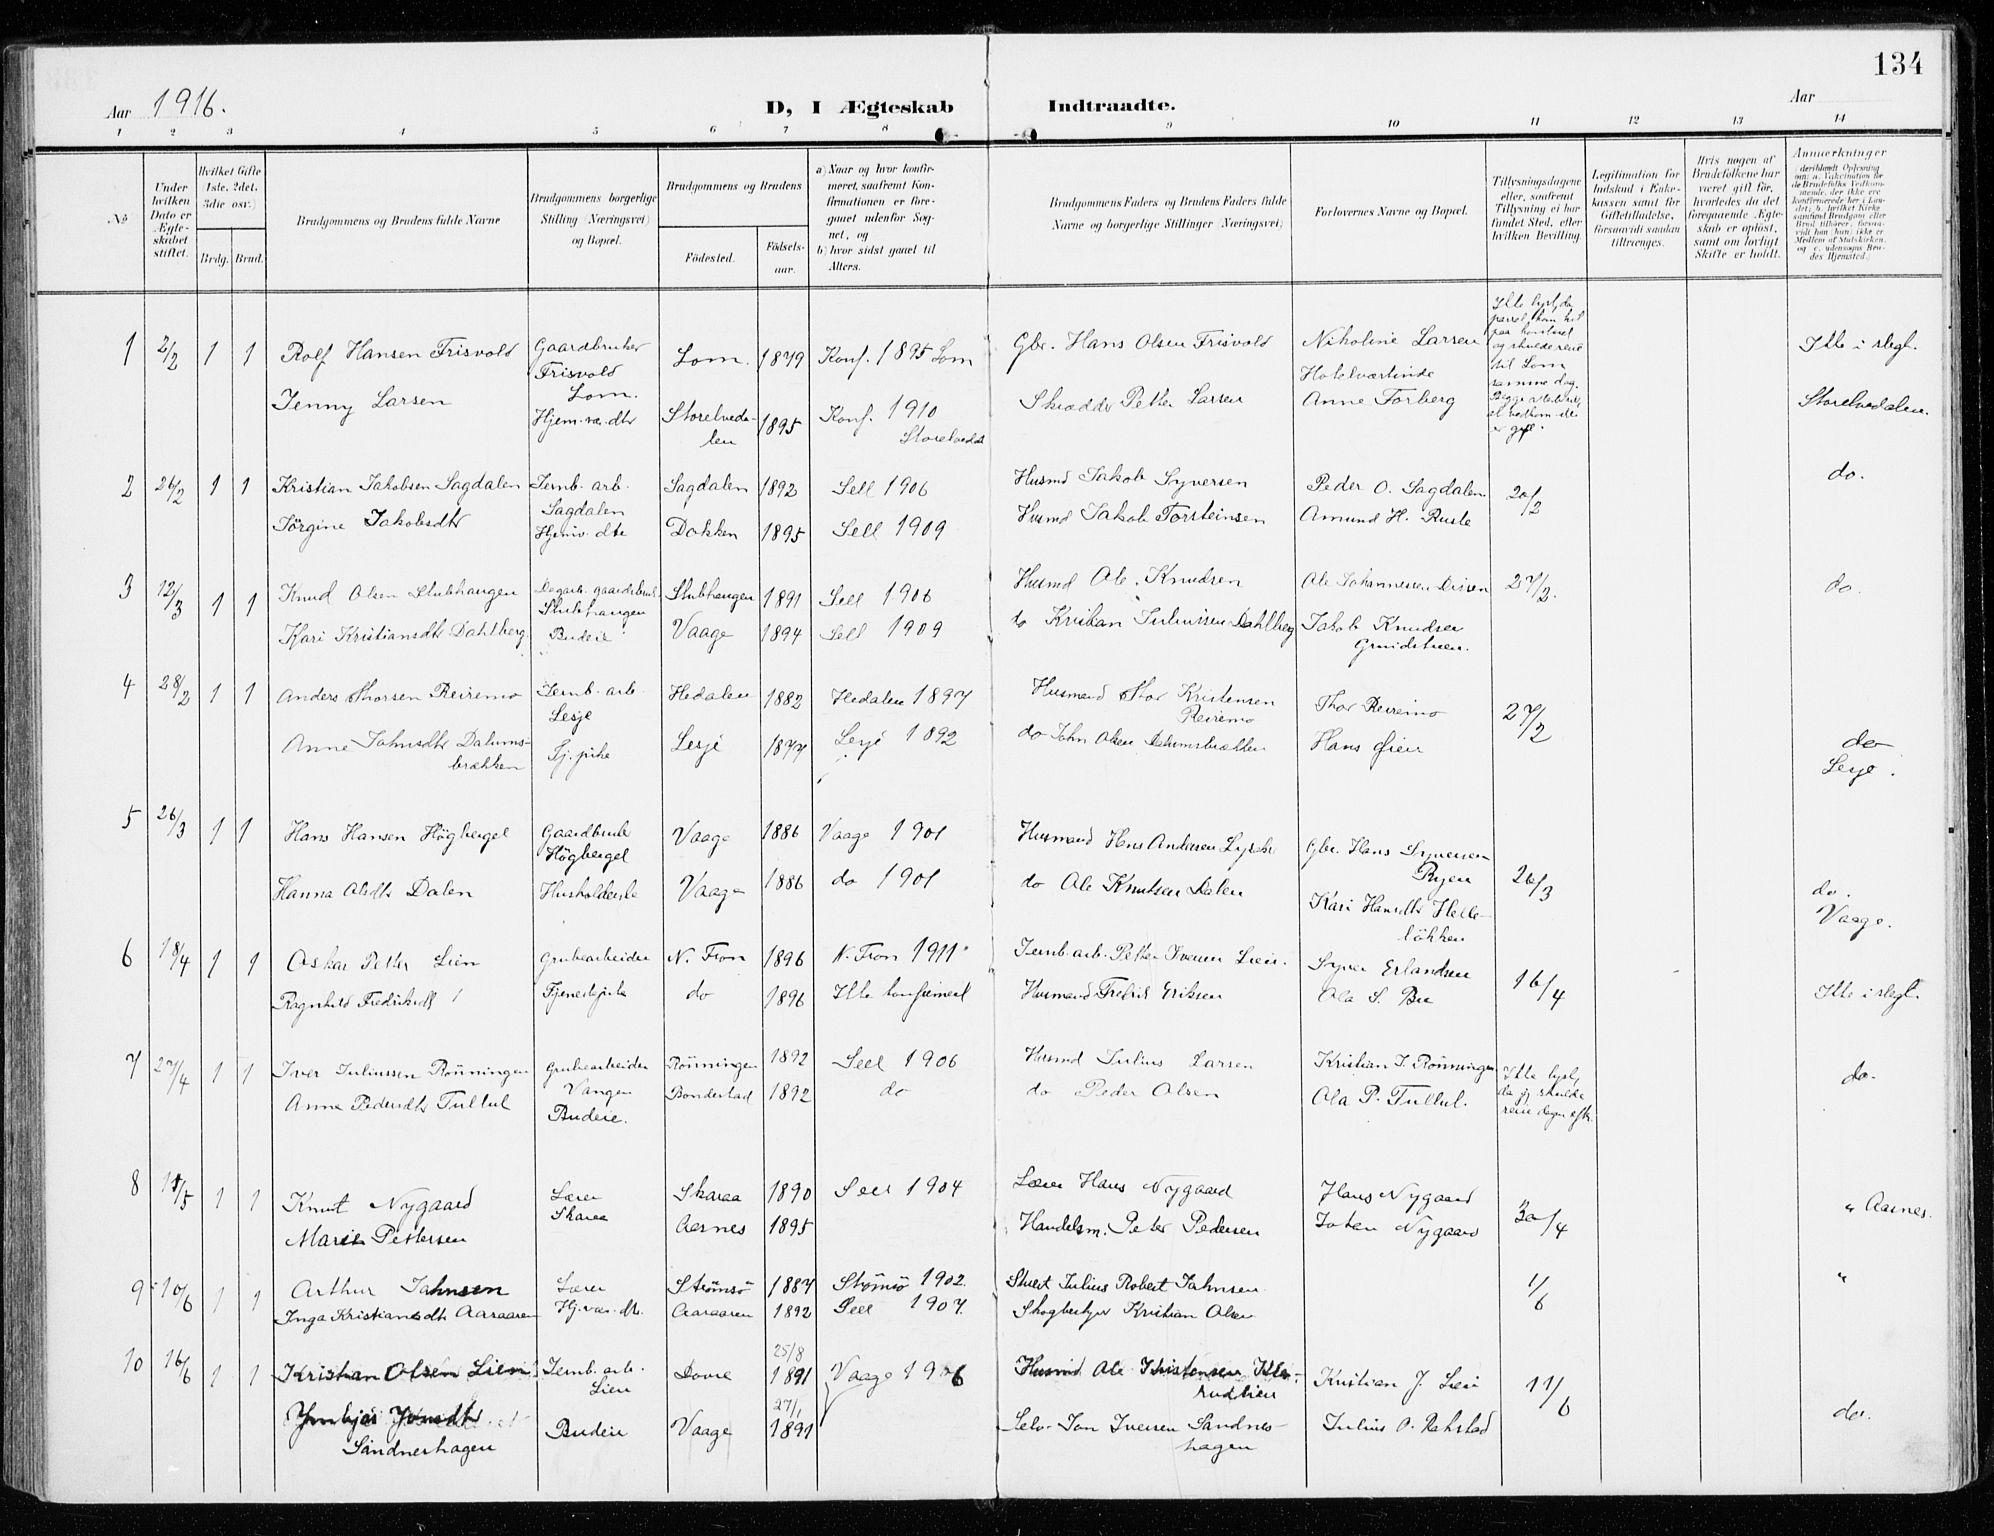 SAH, Sel prestekontor, Ministerialbok nr. 2, 1905-1919, s. 134